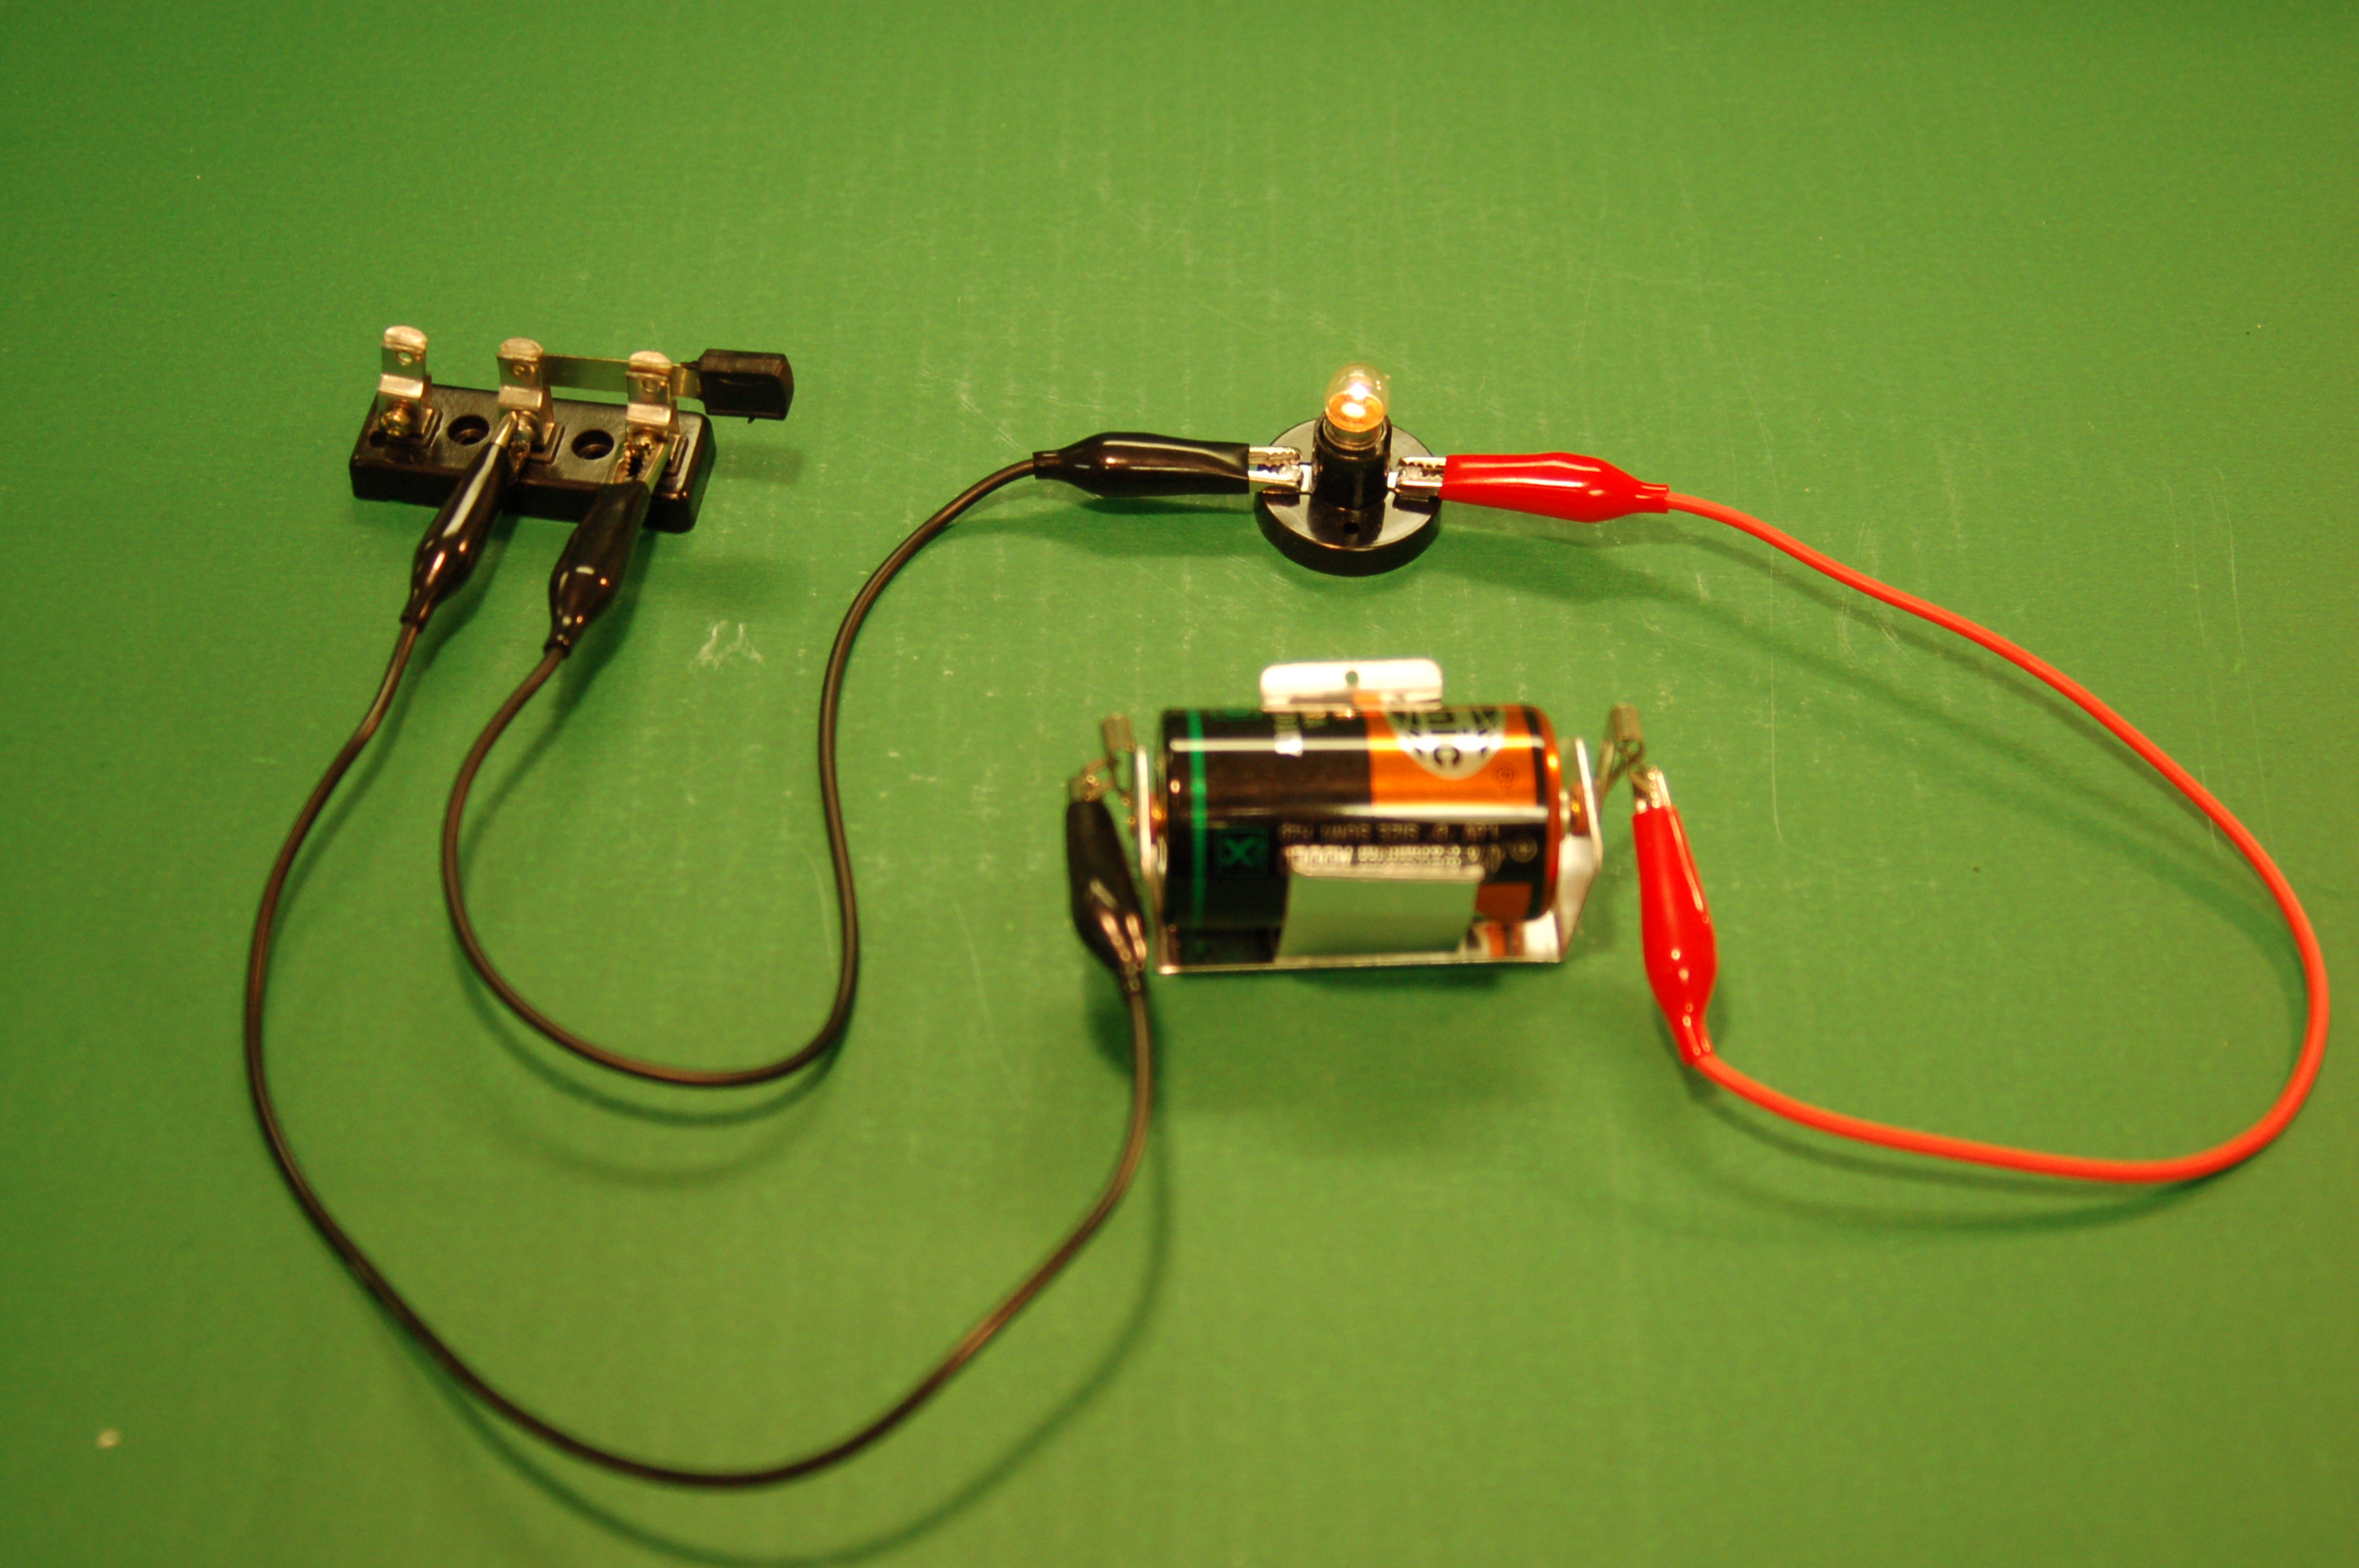 Enjoyable Simple Circuit W Switch Gadget Science Wiring Cloud Xortanetembamohammedshrineorg